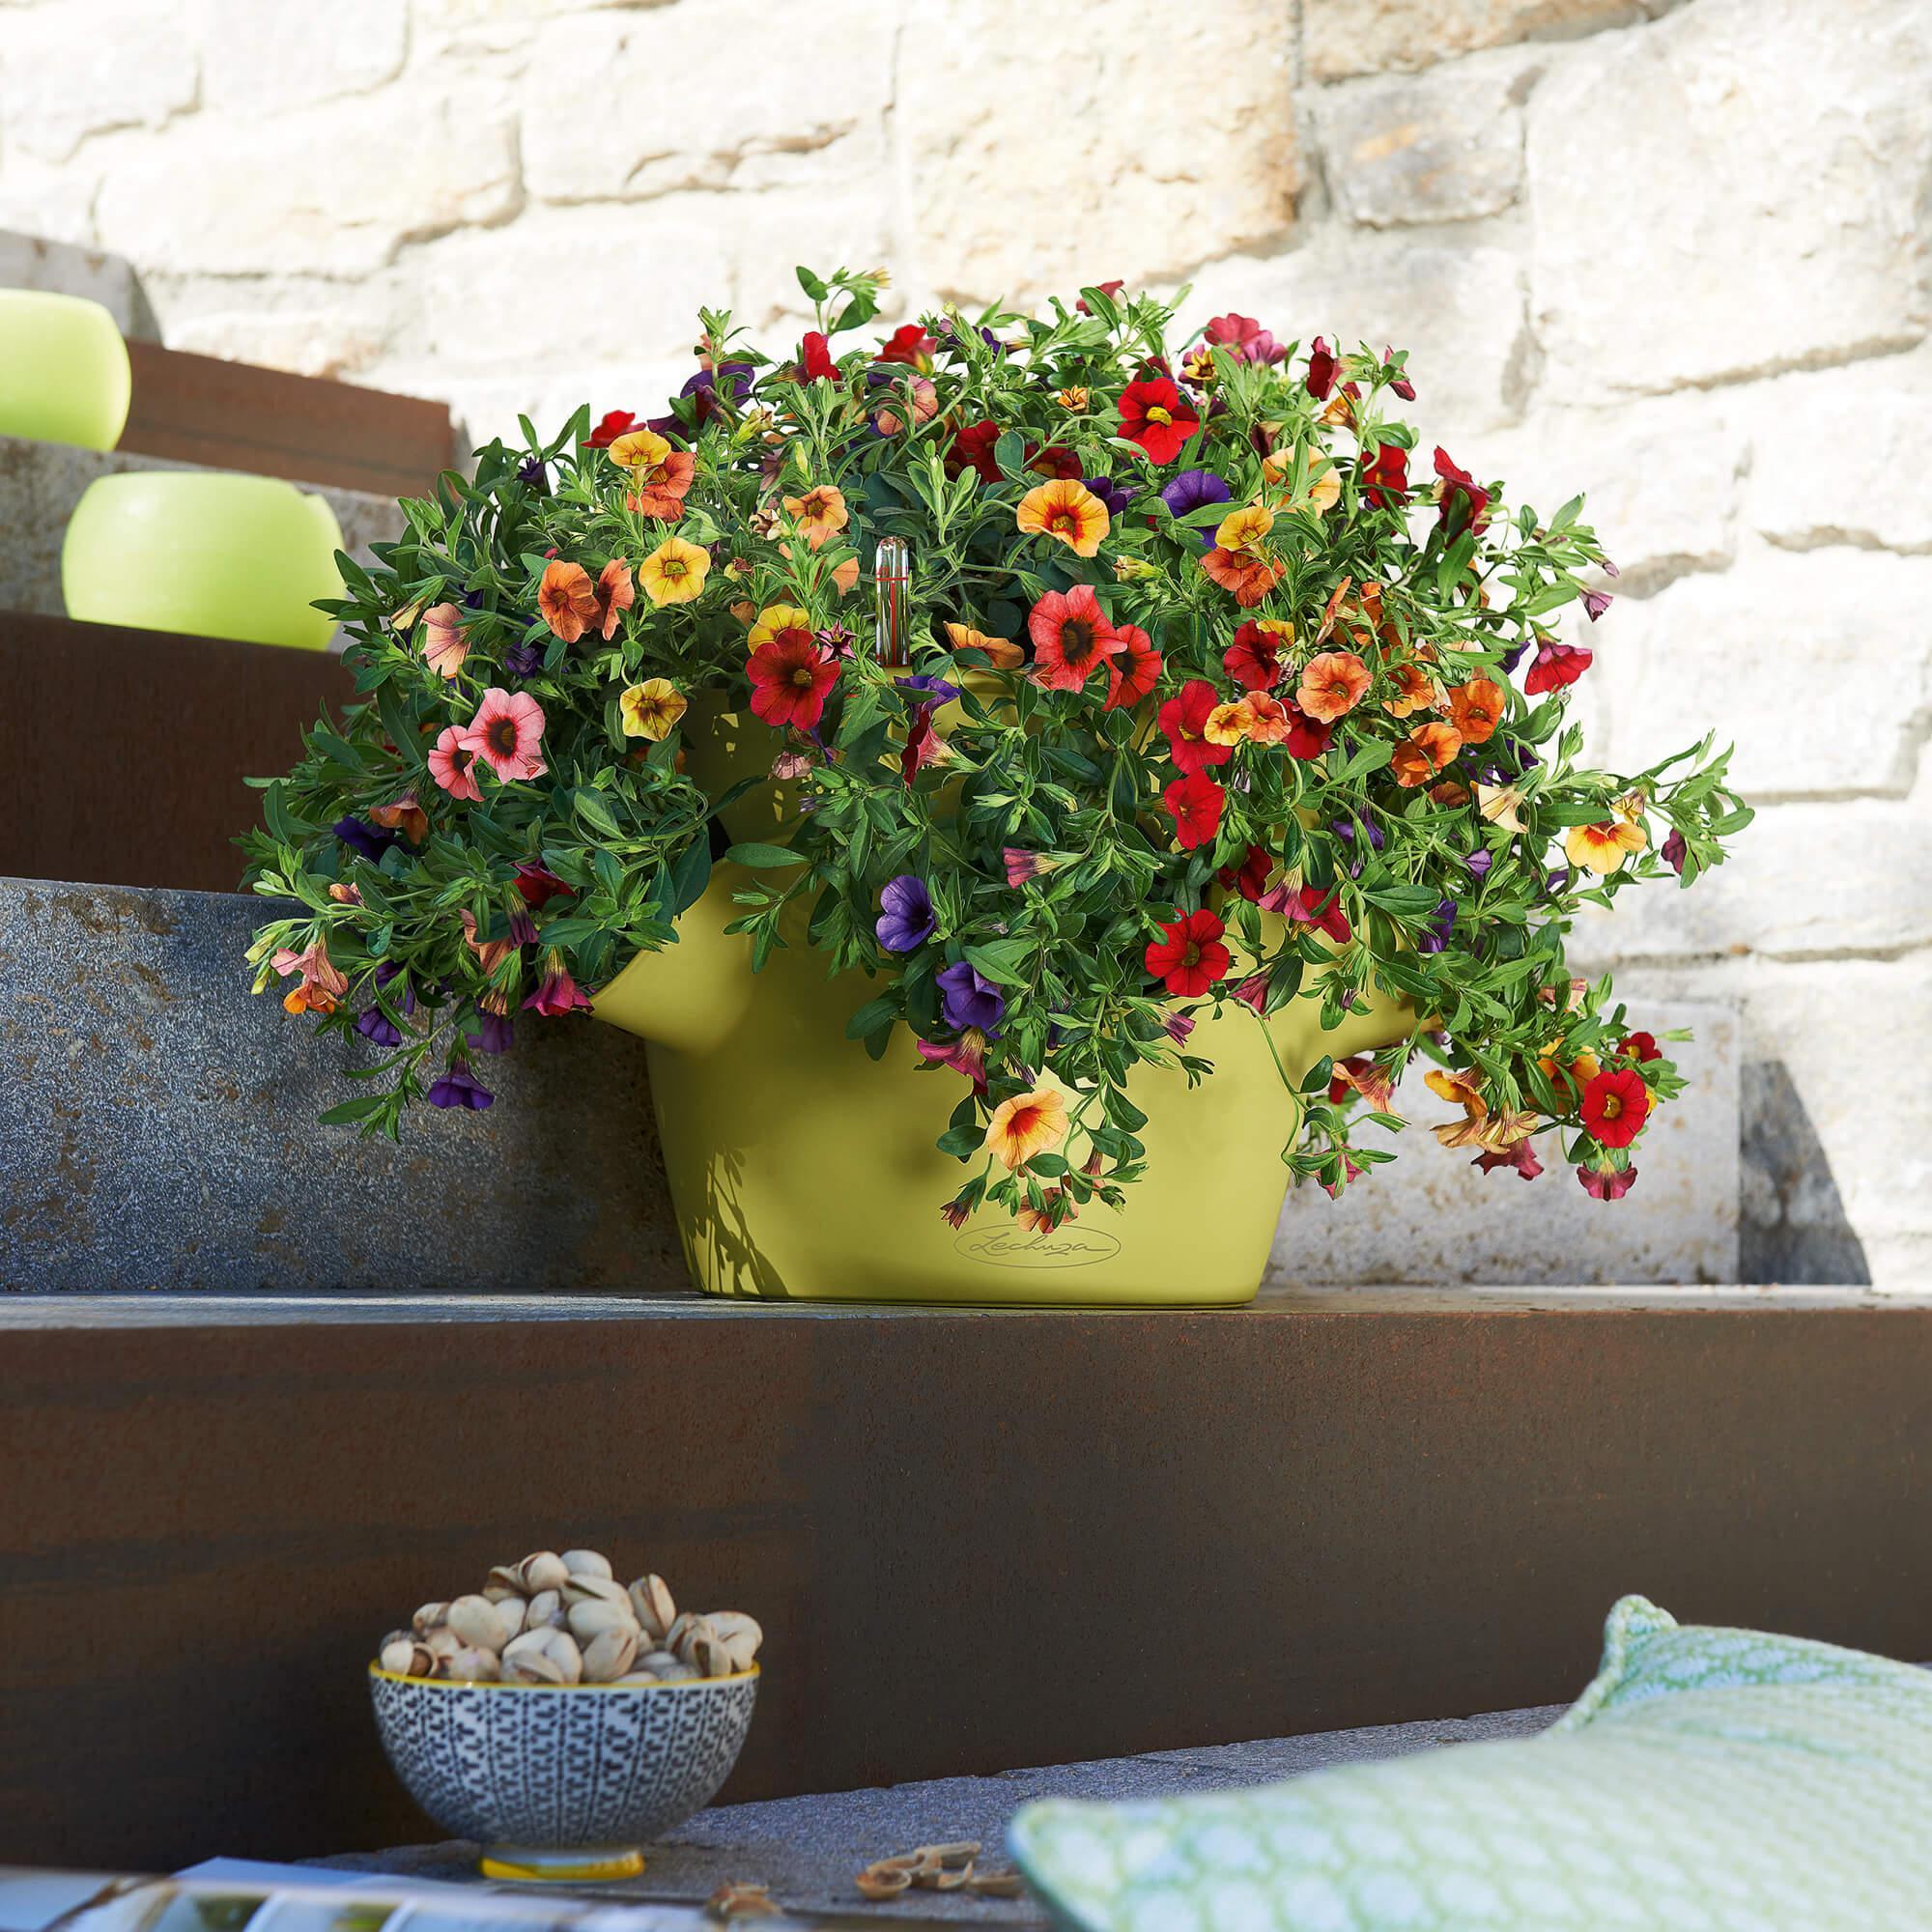 CASCADINO Color pistachio - Image 3